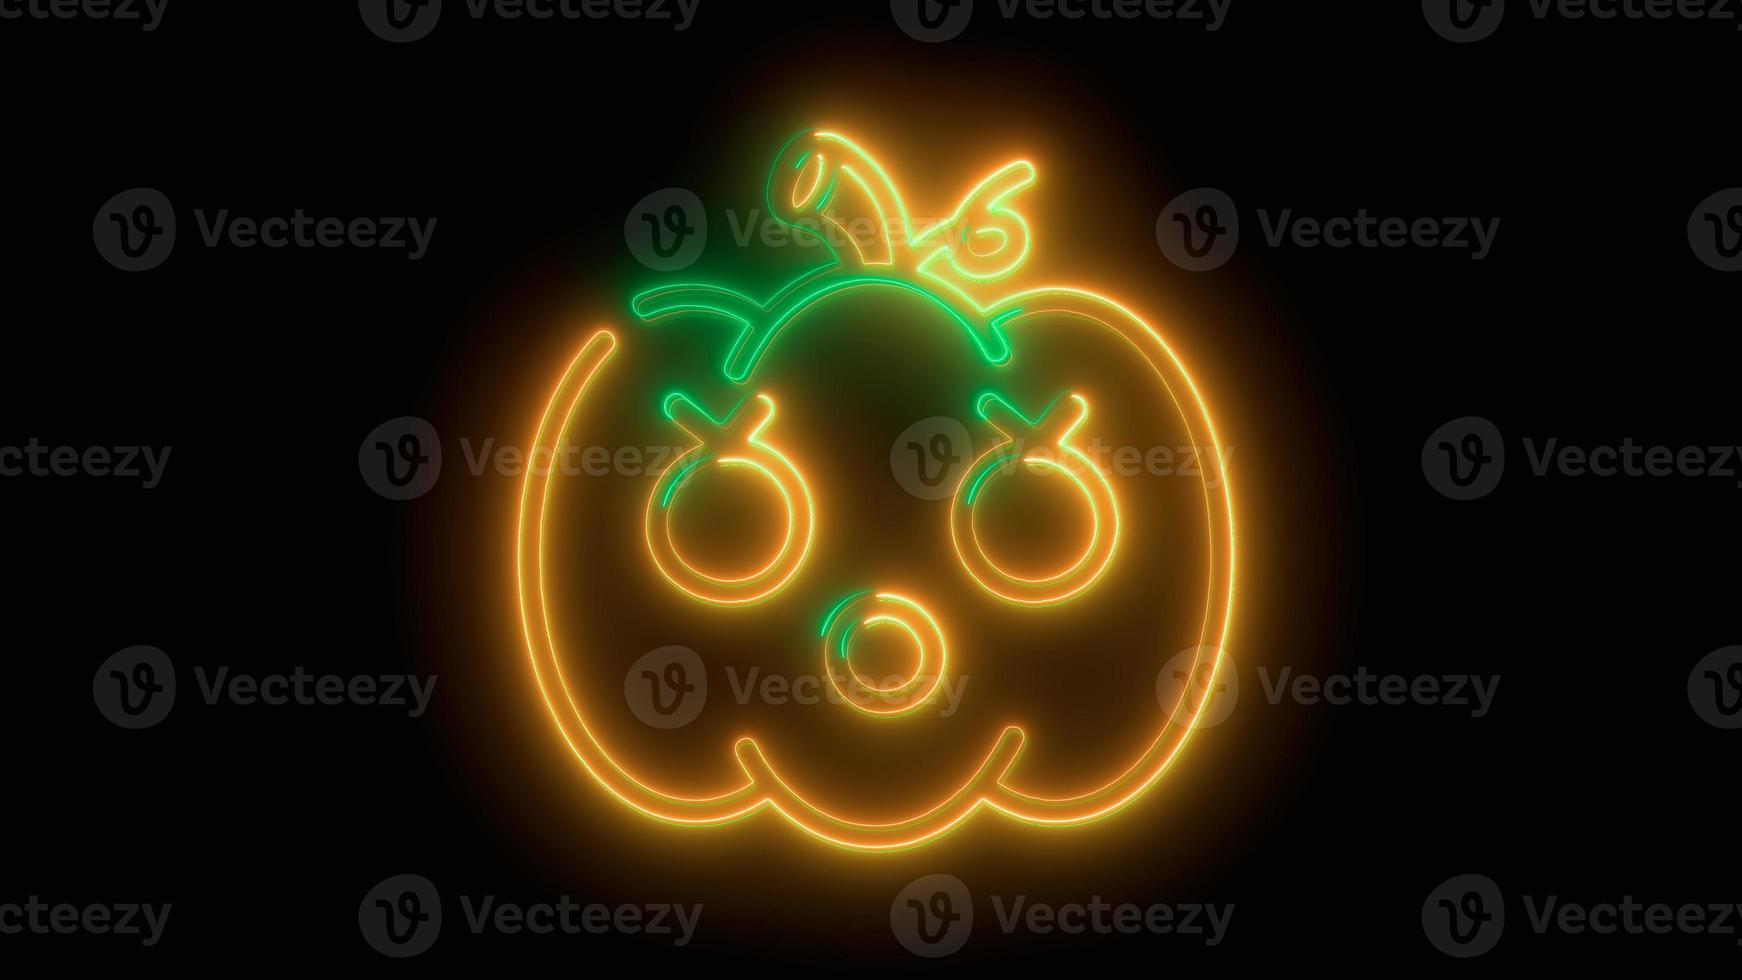 arancione neon, zucca gialla di halloween, emoji, rendering 3d, foto